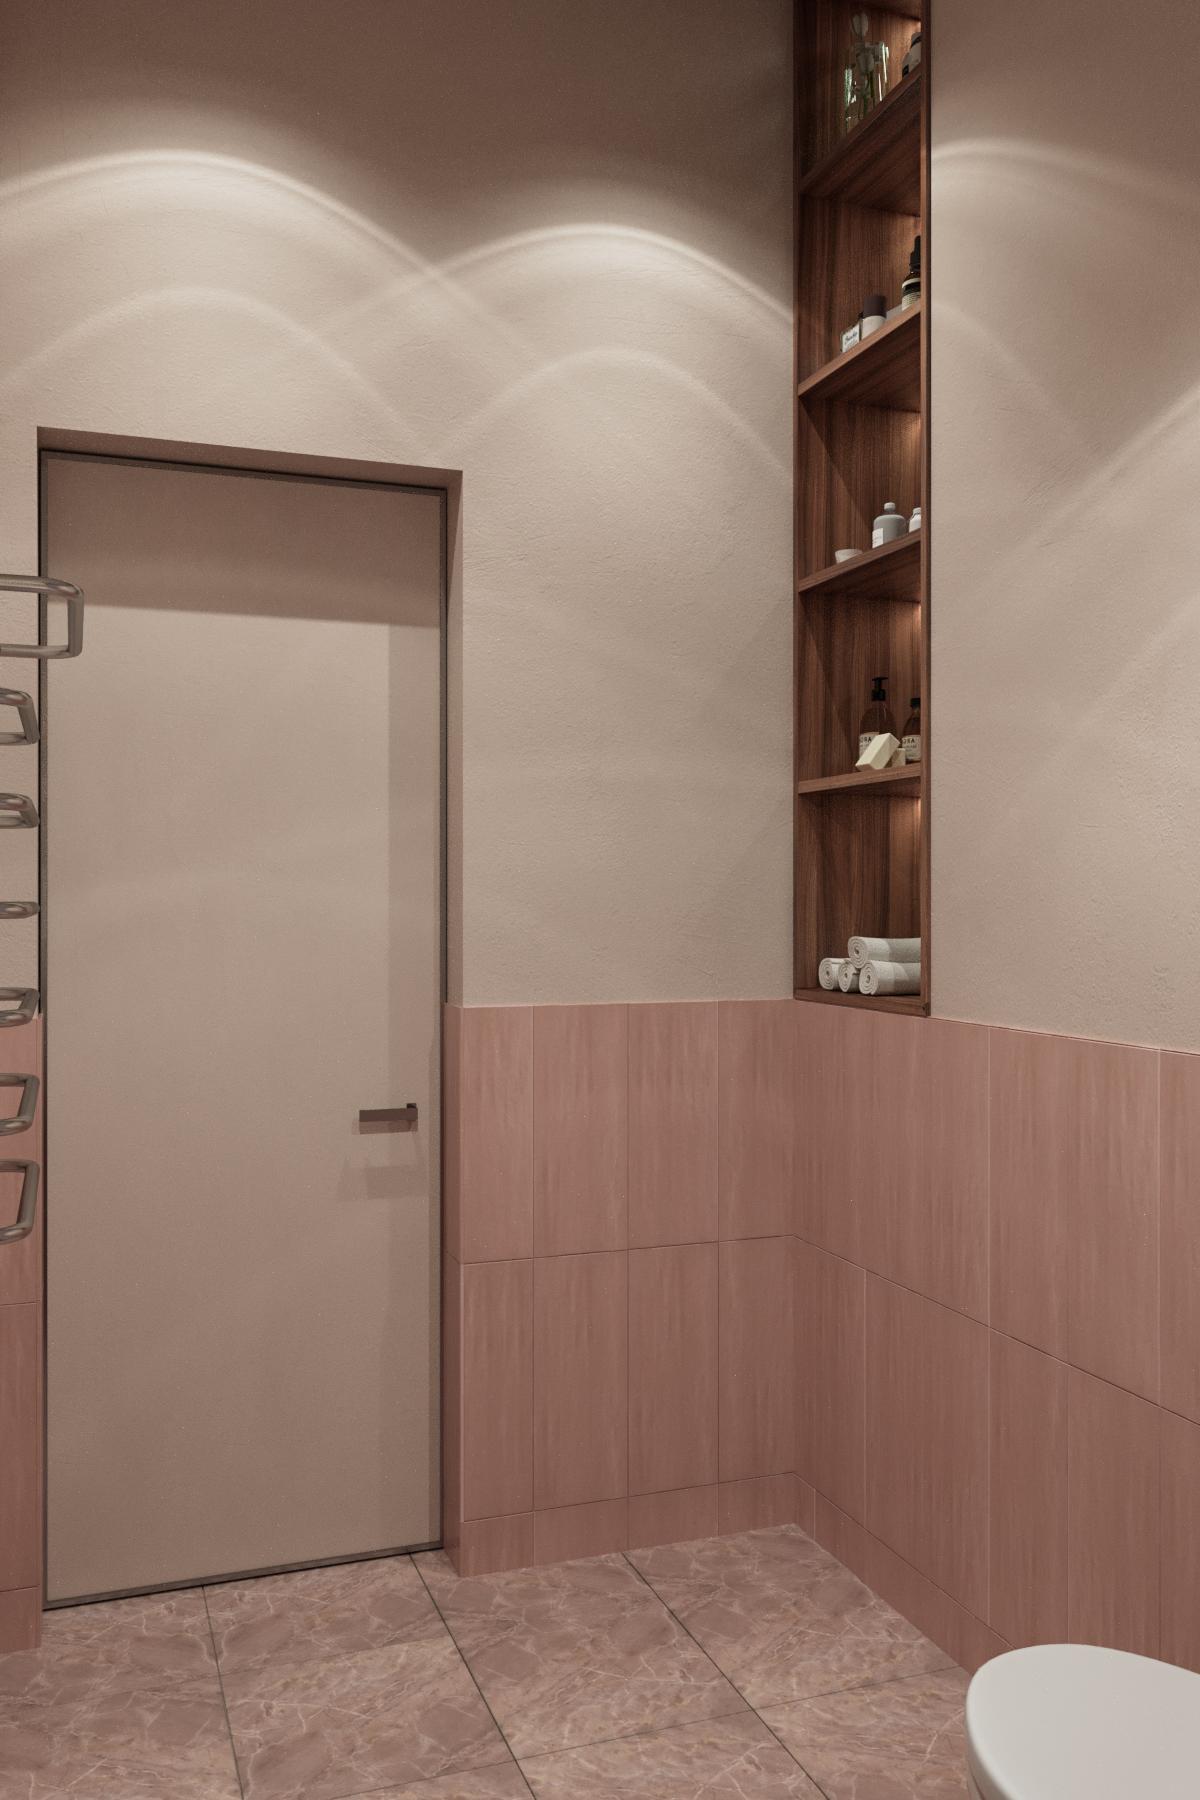 bathroom_guest_2fl_vladimirskaya_obl_30.07.2020_02